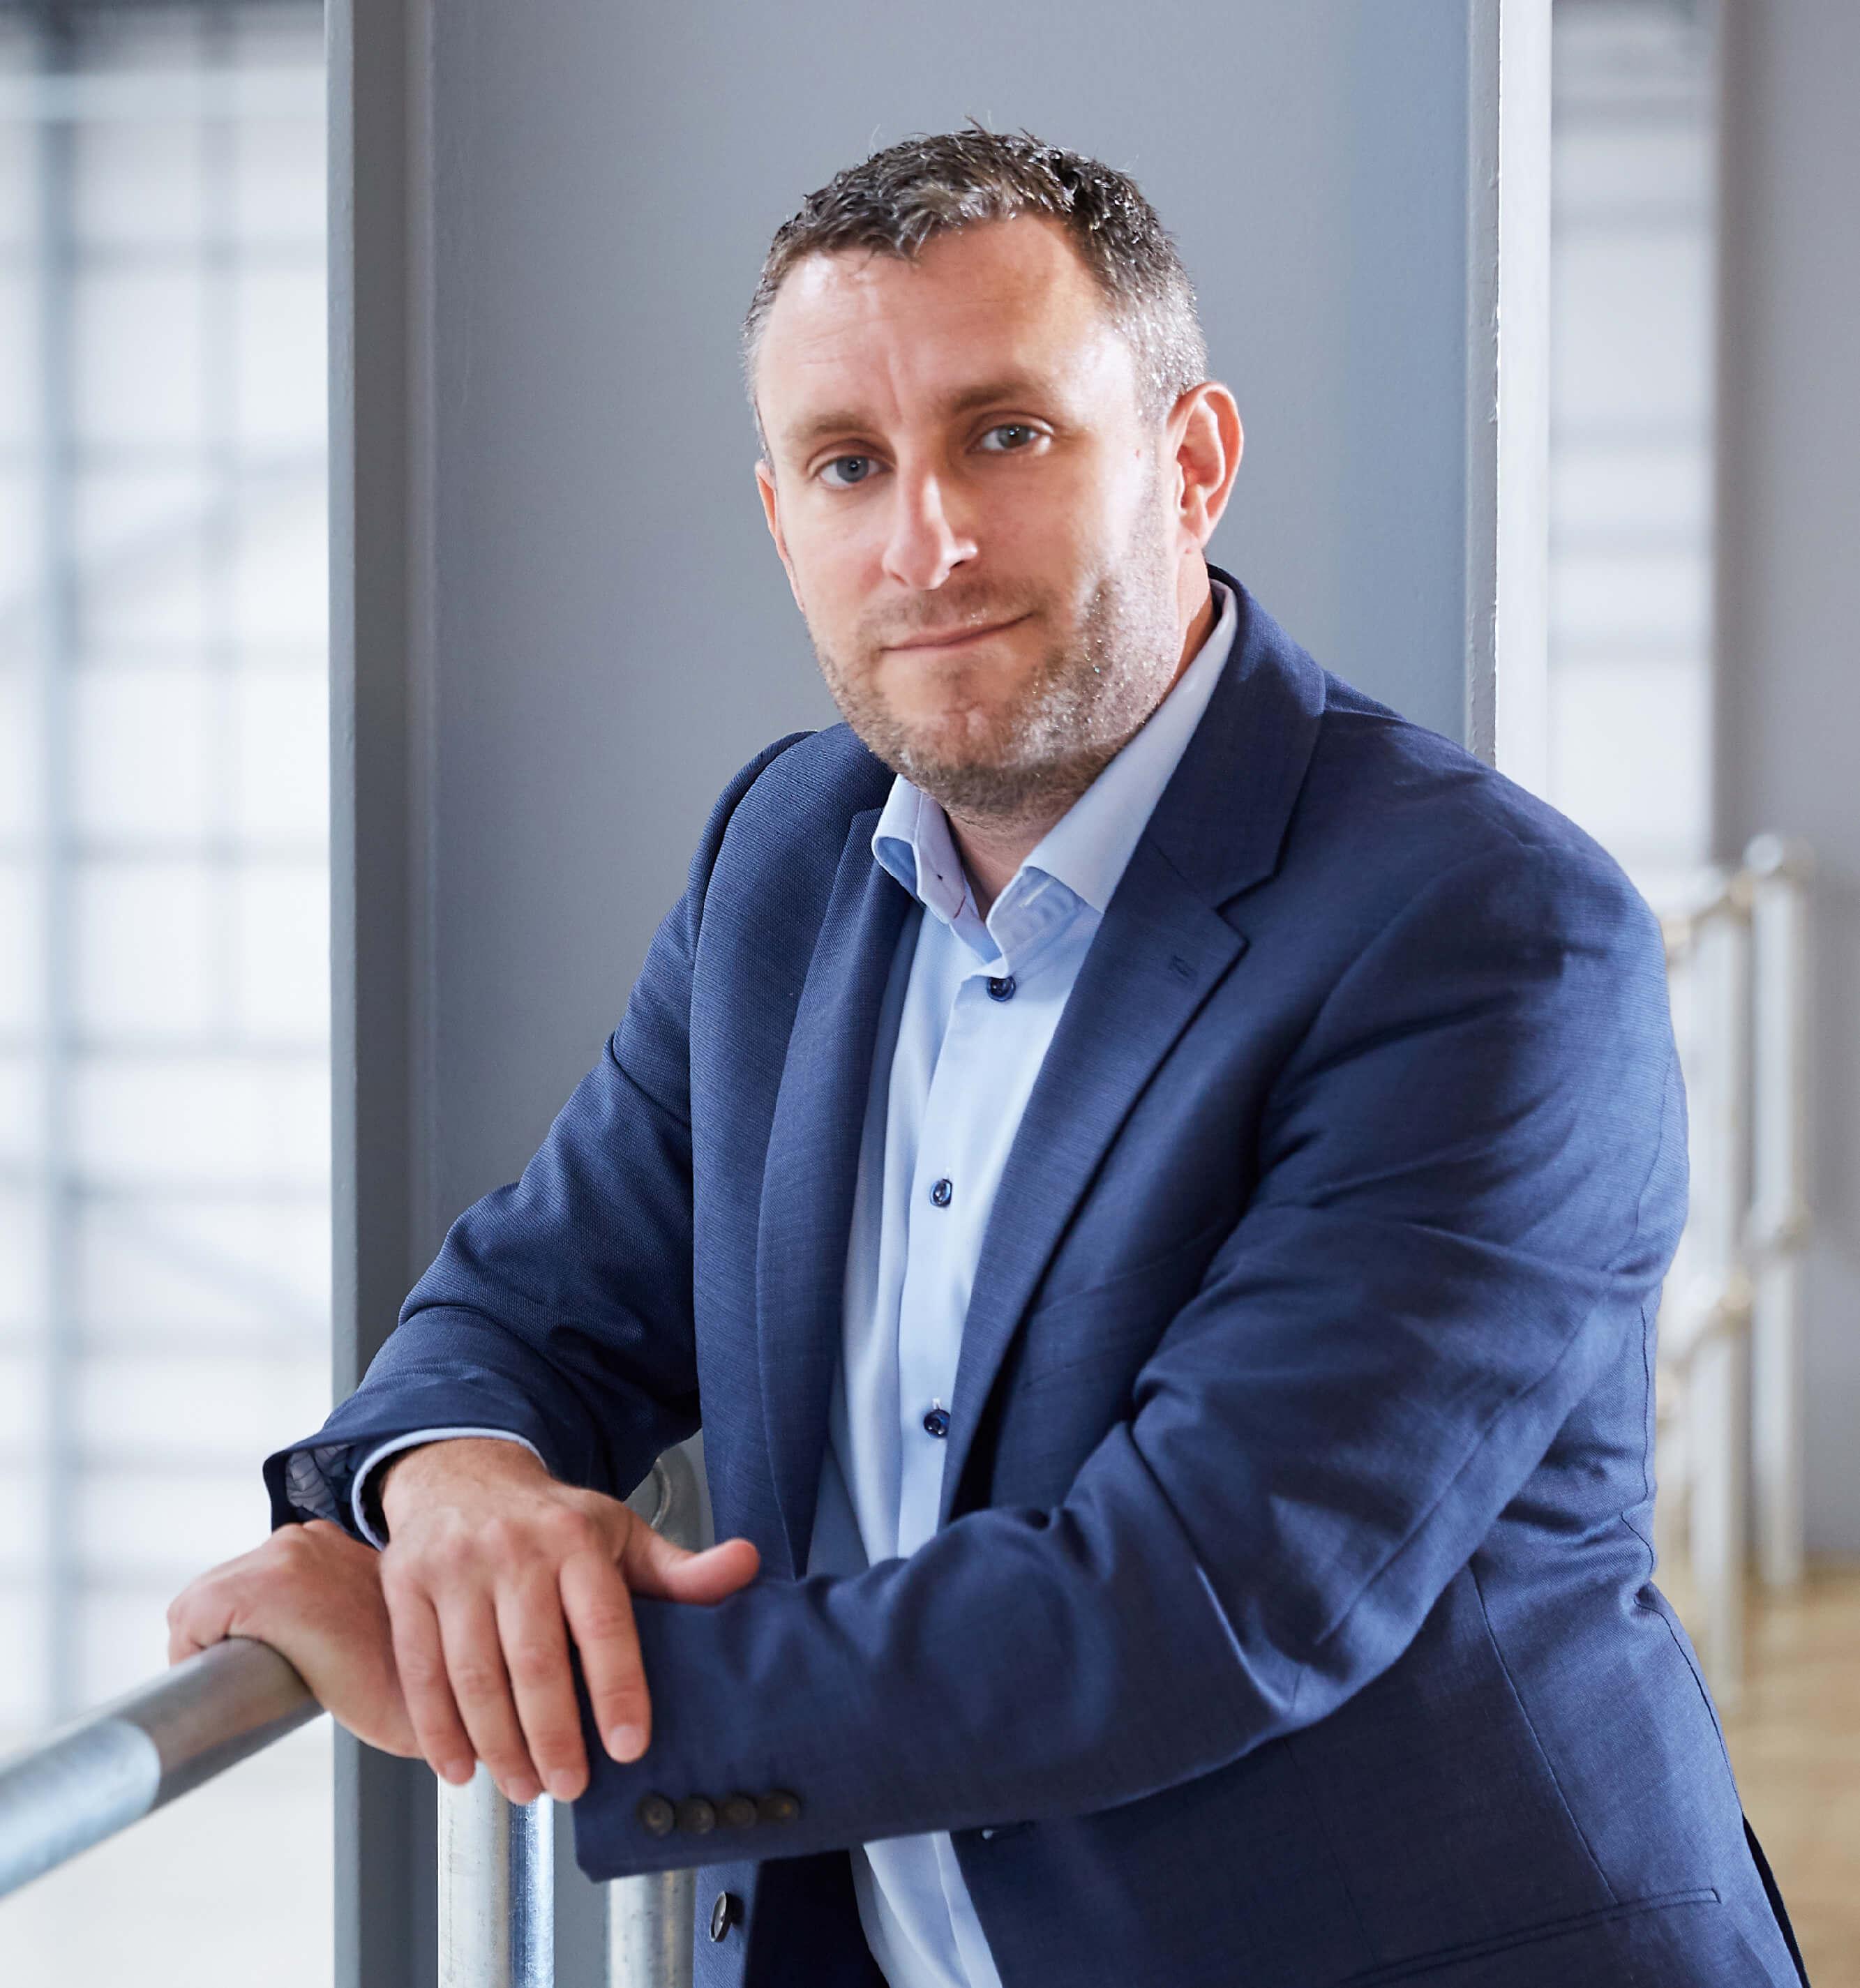 Paul Stephens - <br>Managing Director of Readie Construction